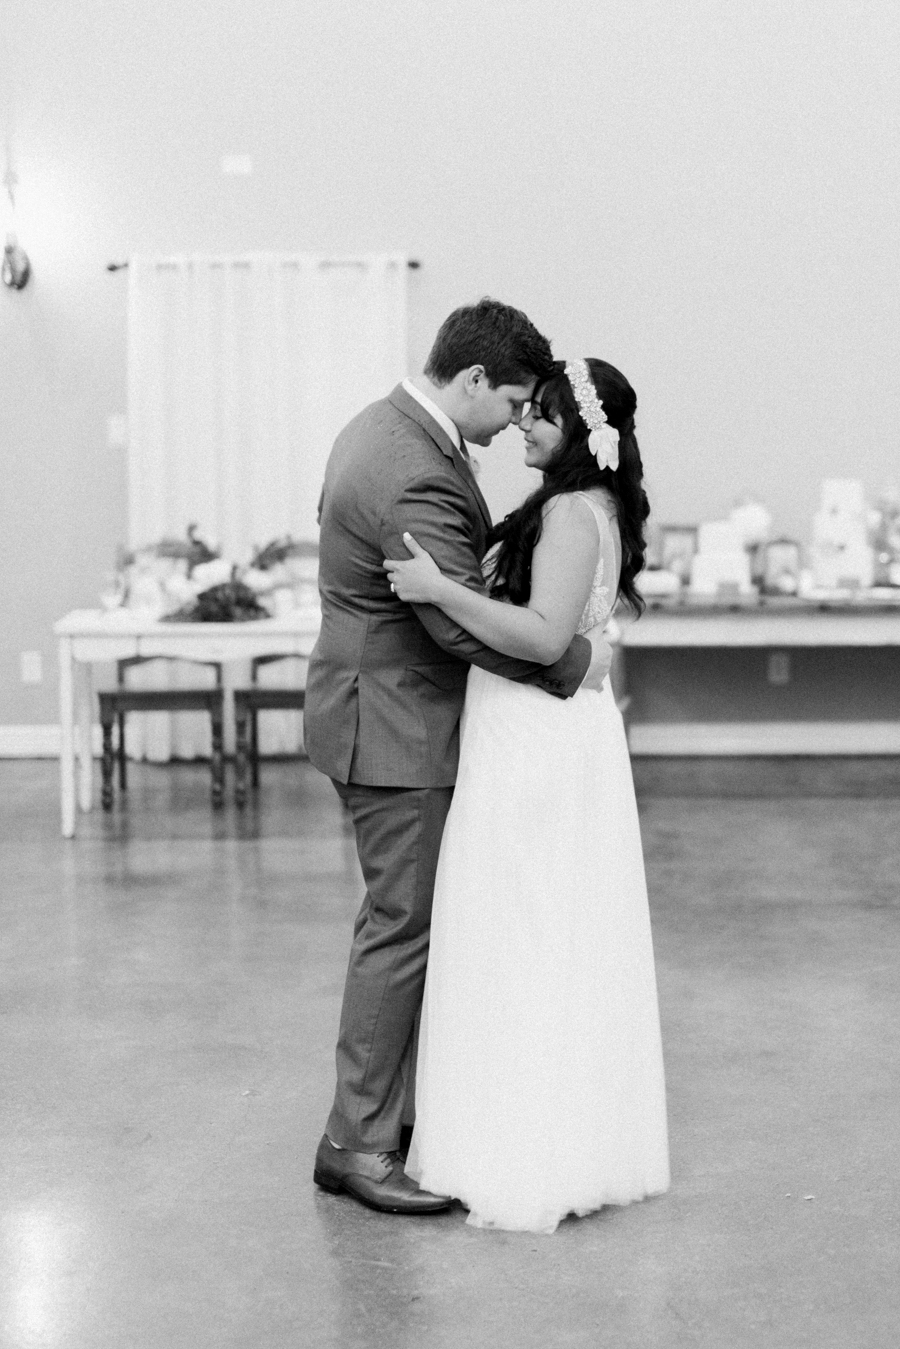 Dana Fernandez Photography Houston Texas Destination Photographer Film Ruffled Blog Wedding Bridal First Look Featured Photography -27.jpg